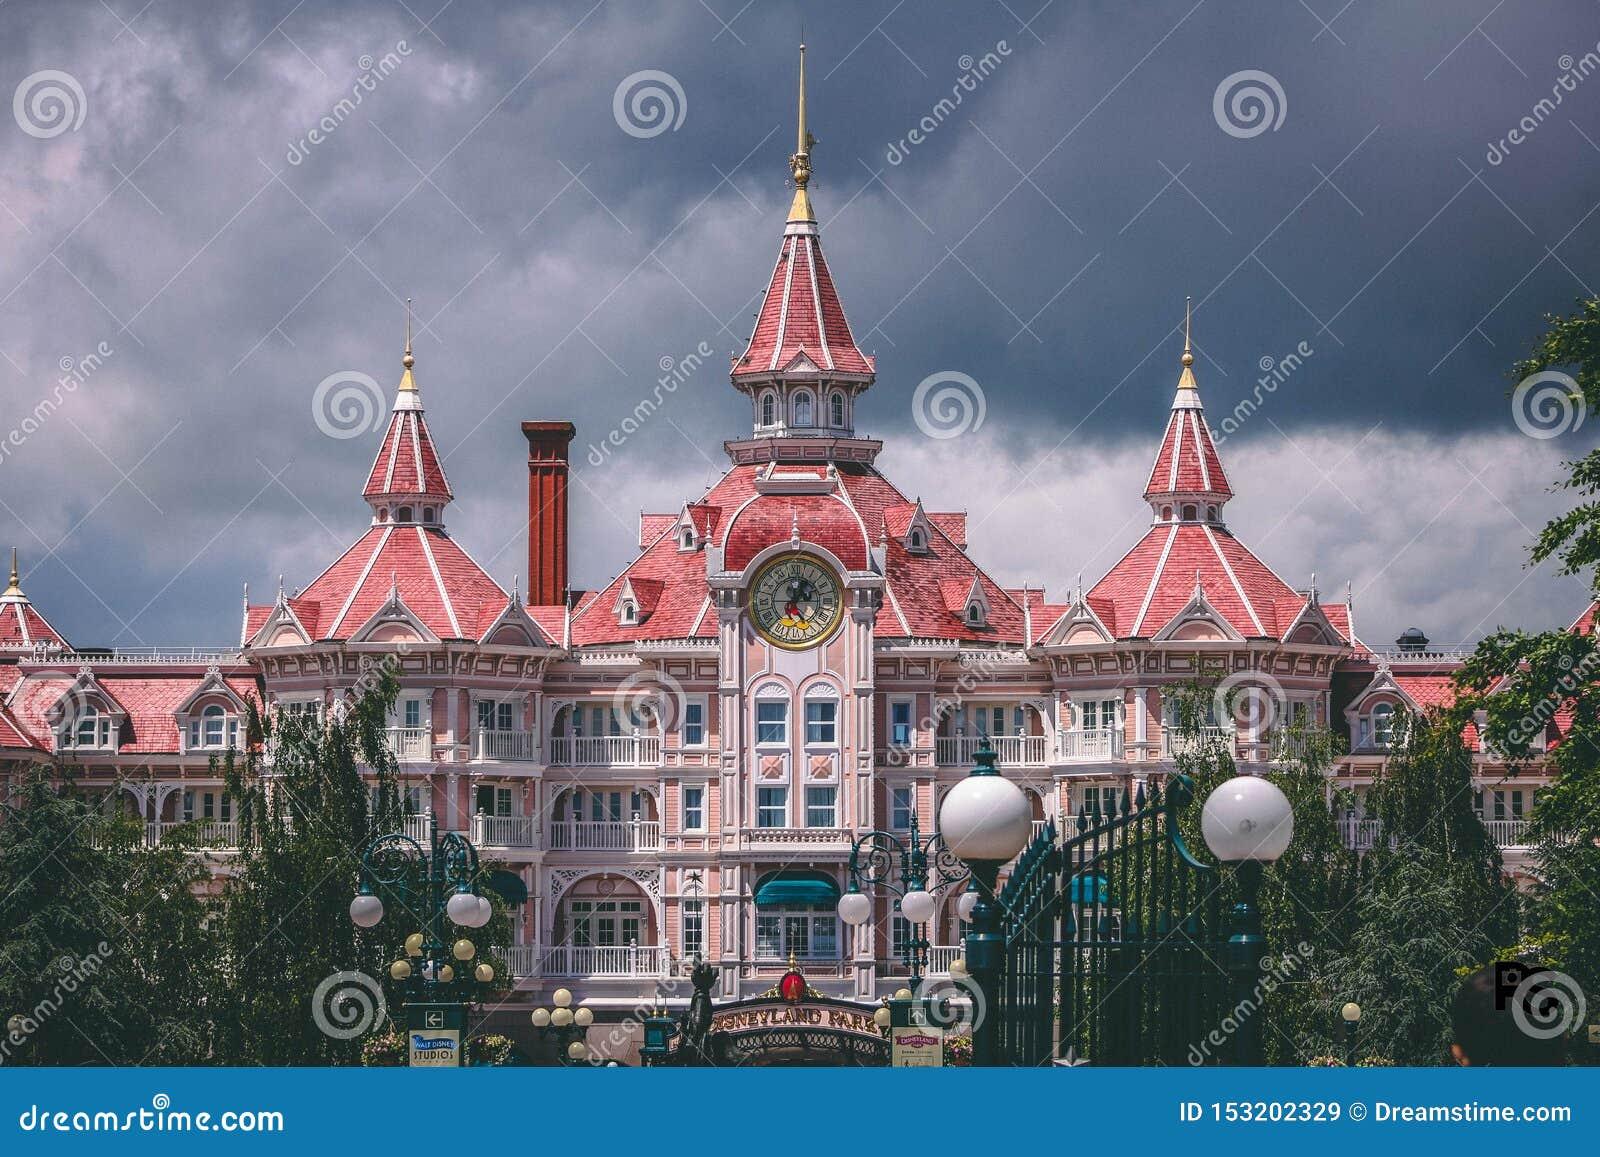 Disneyland Paris entrou